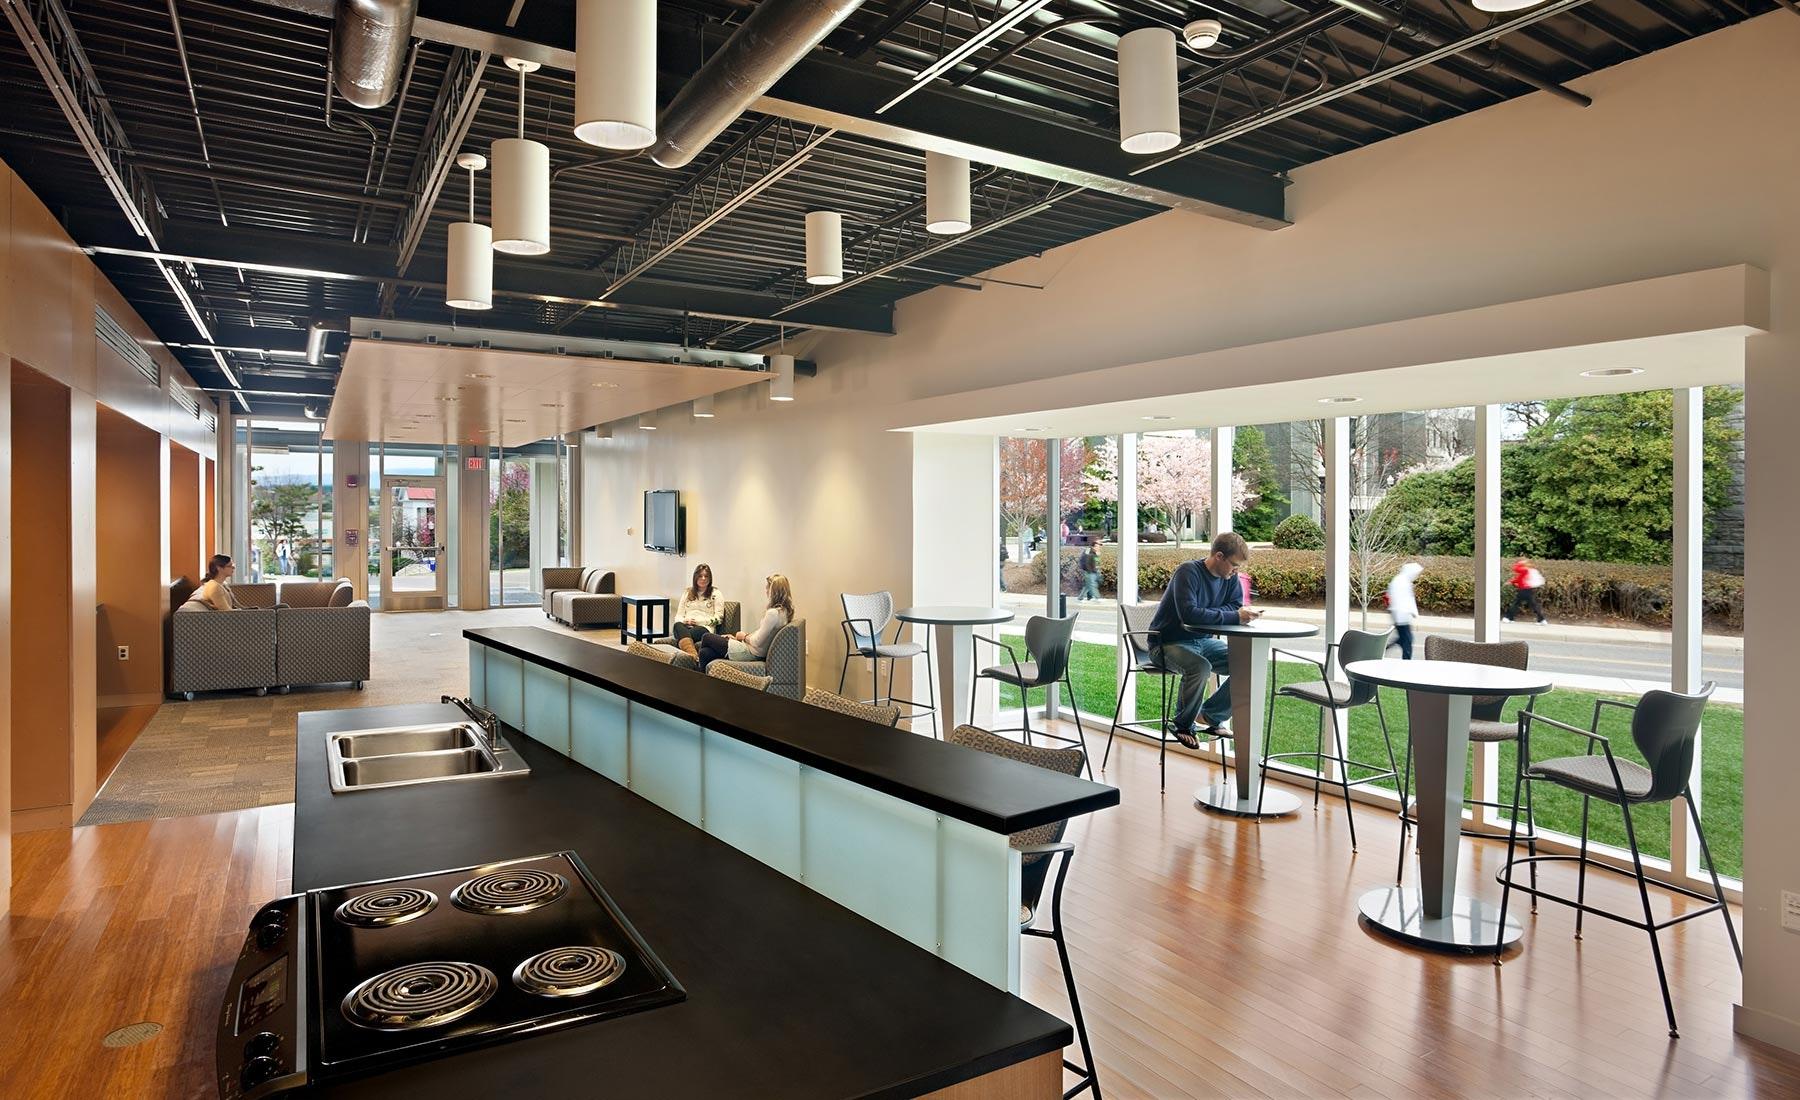 JMU Architecture and Interior Design